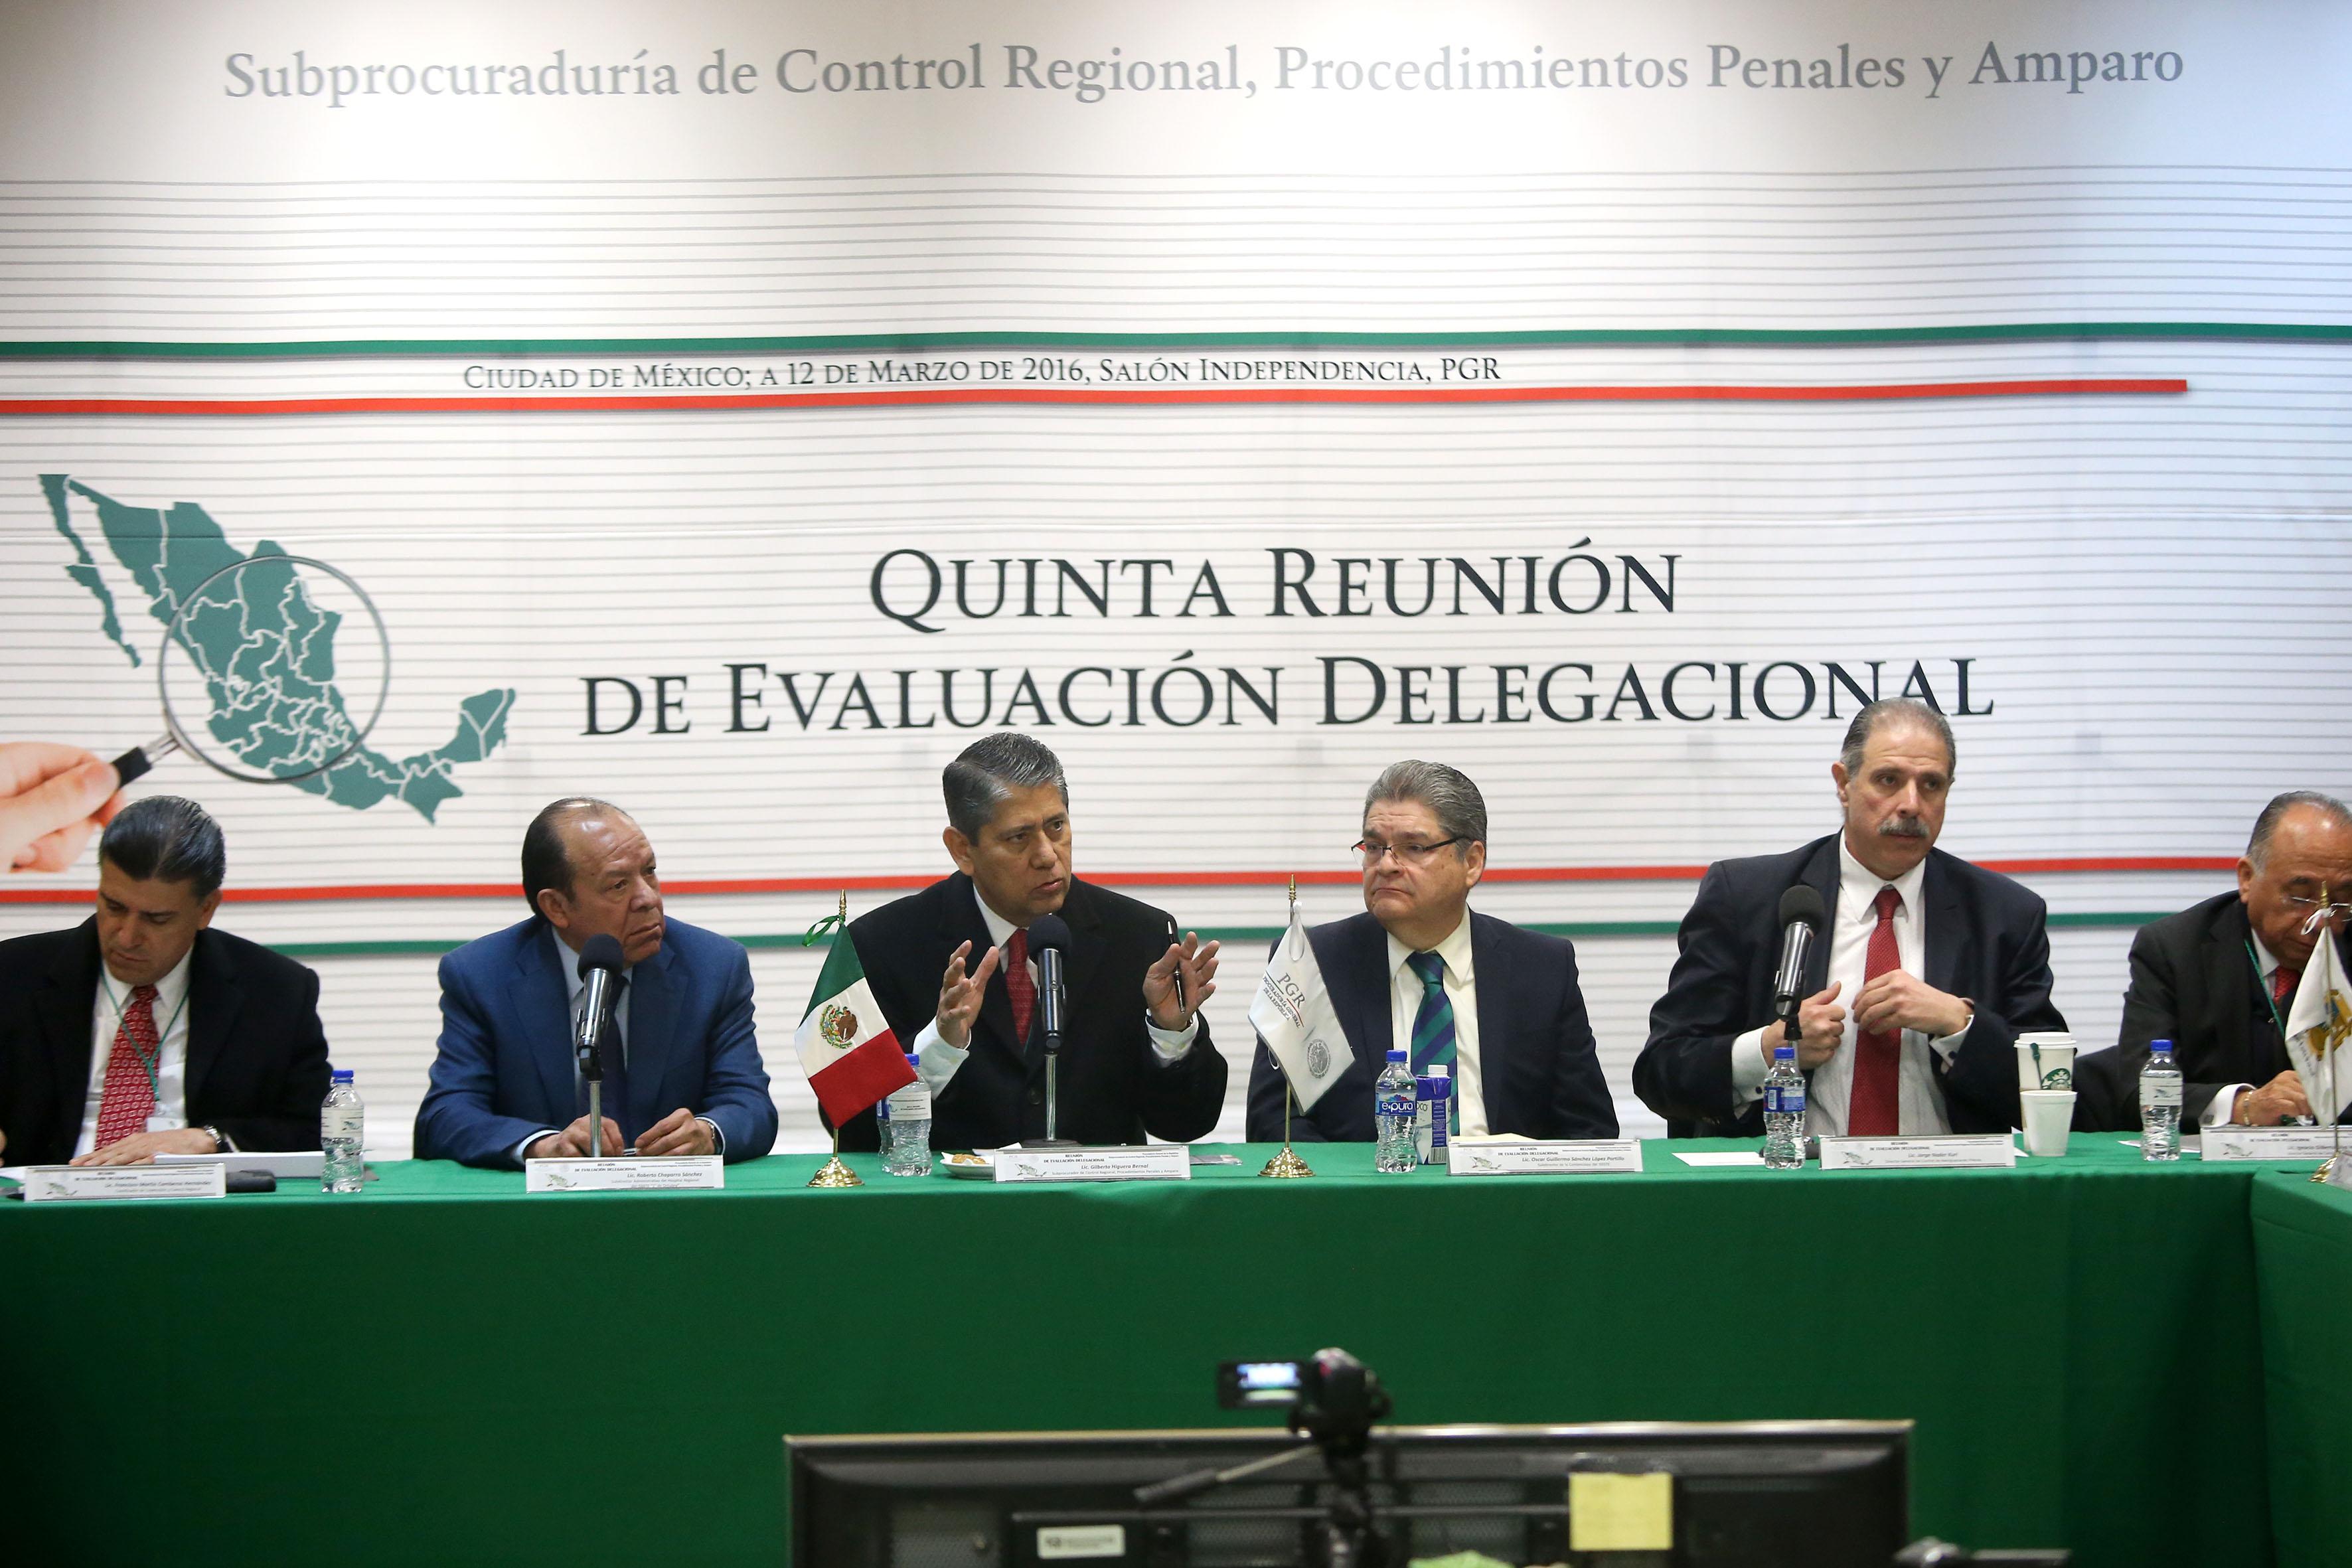 12 03 16 5a Reunio n delegacional PGR11.jpg